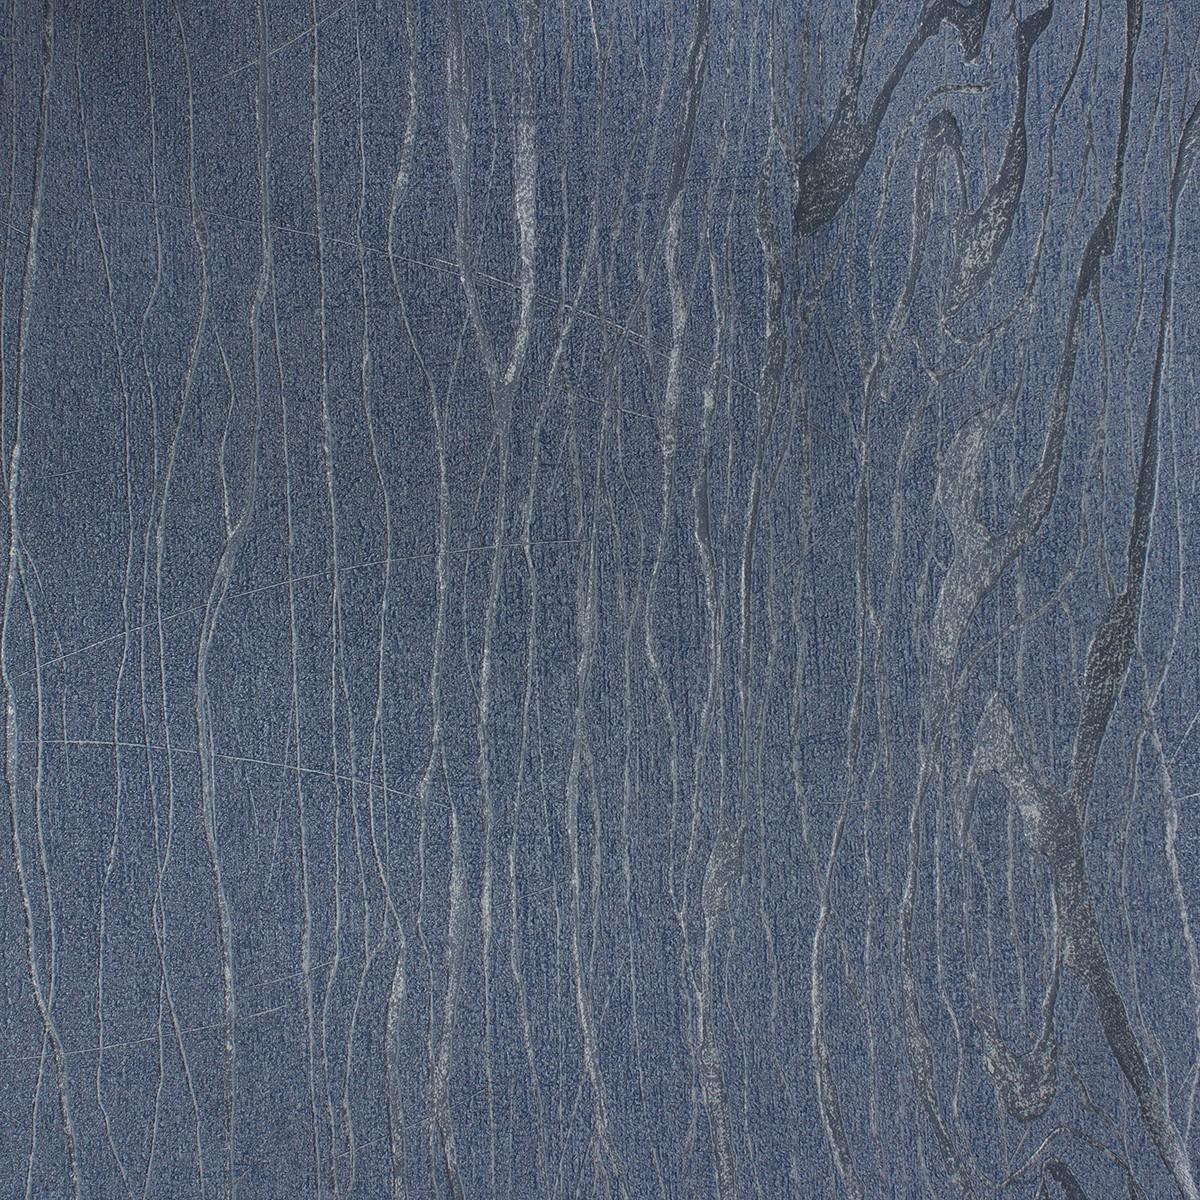 vliestapete luigi colani struktur blau 53330. Black Bedroom Furniture Sets. Home Design Ideas